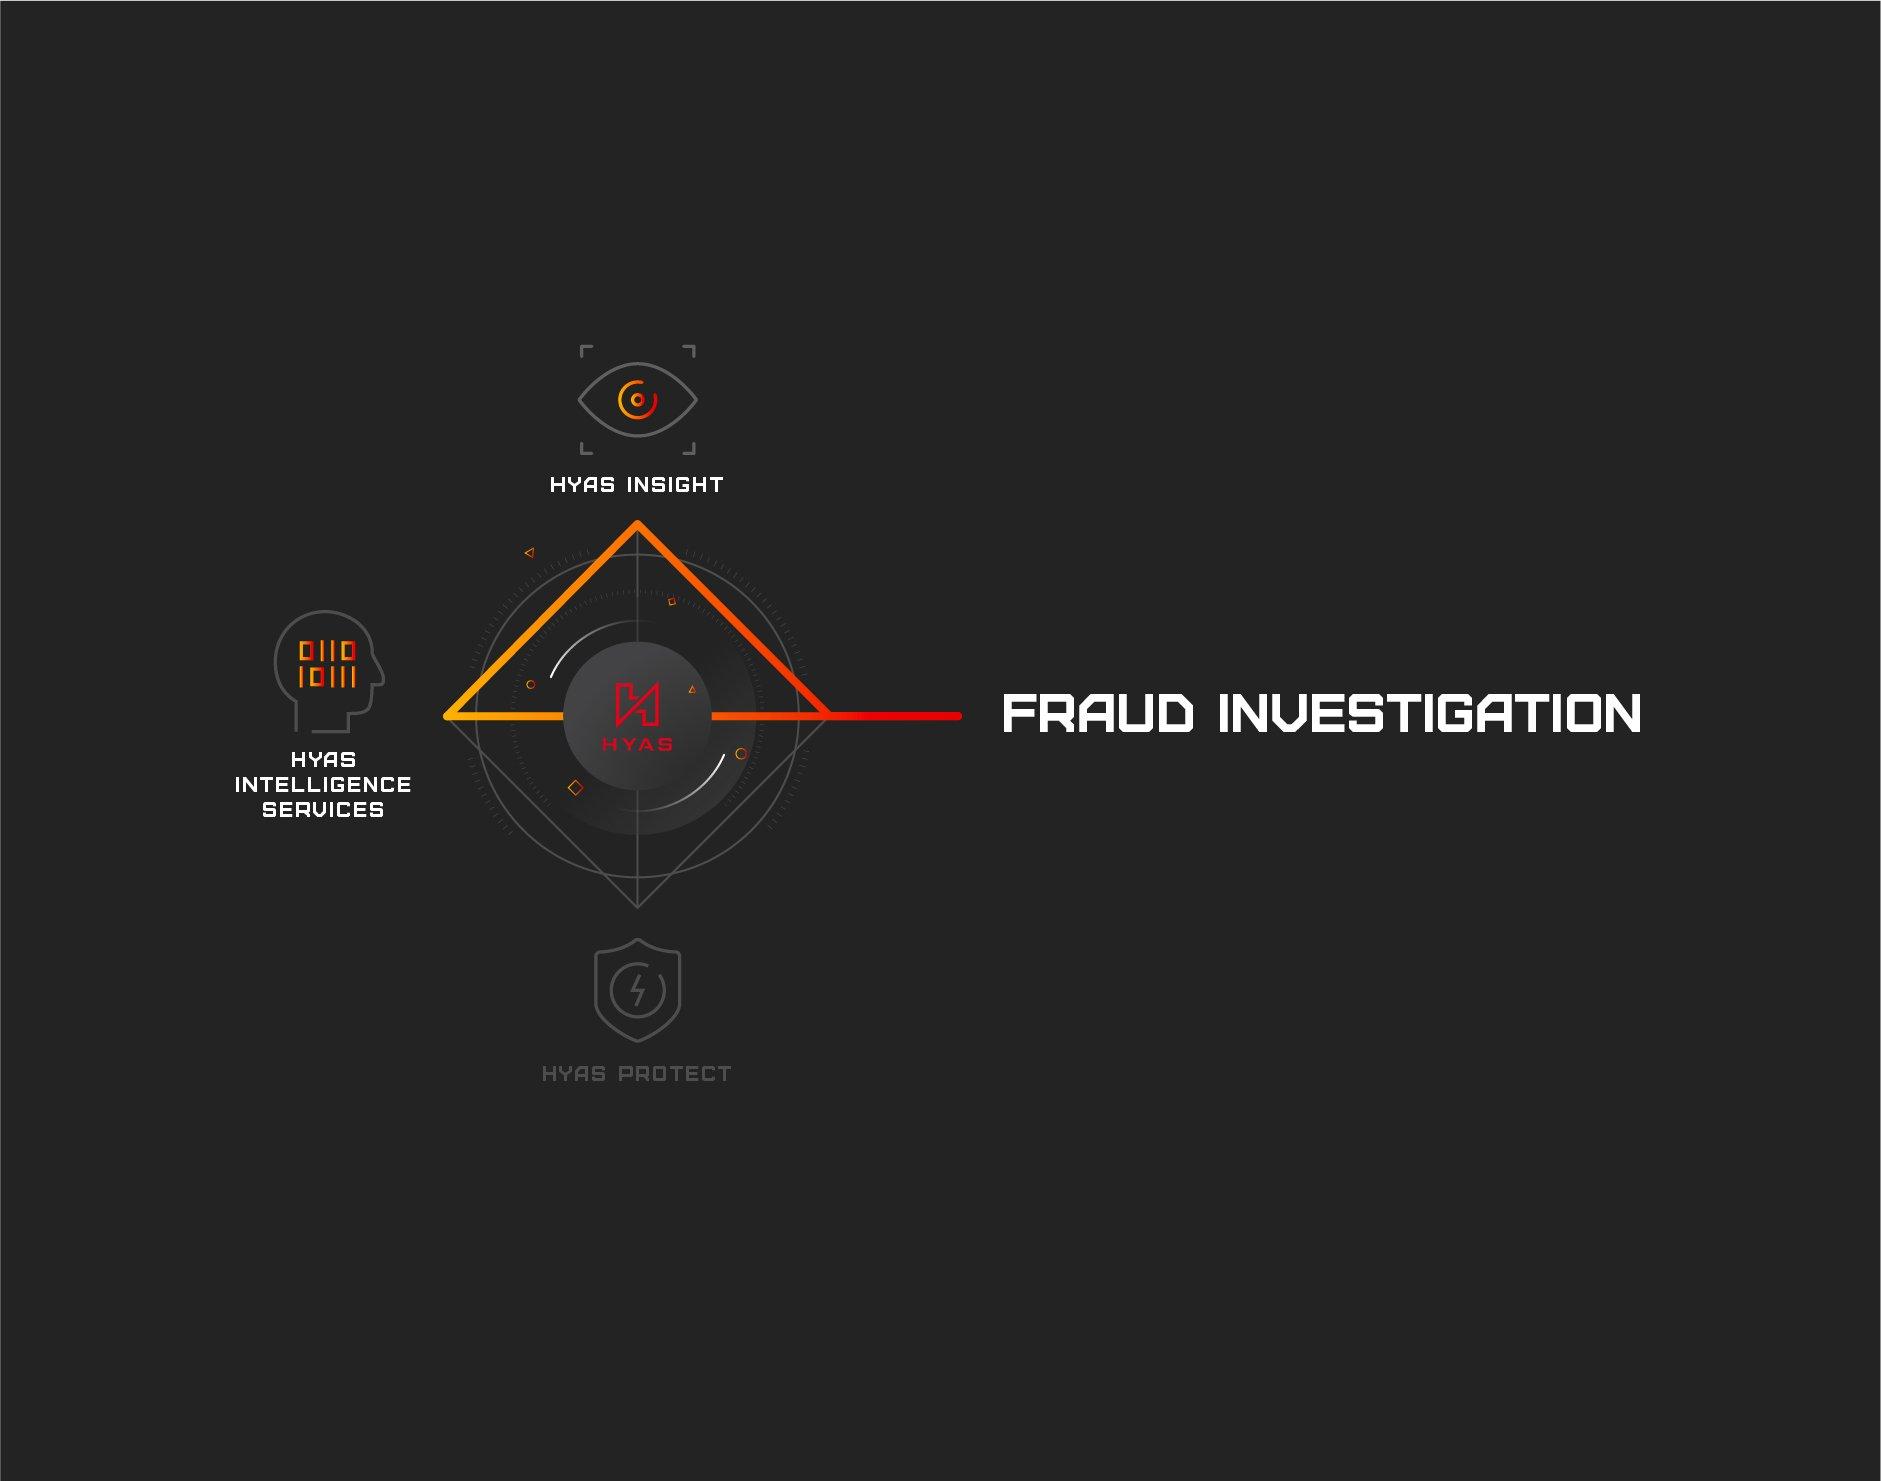 fraud investigation@4x-100